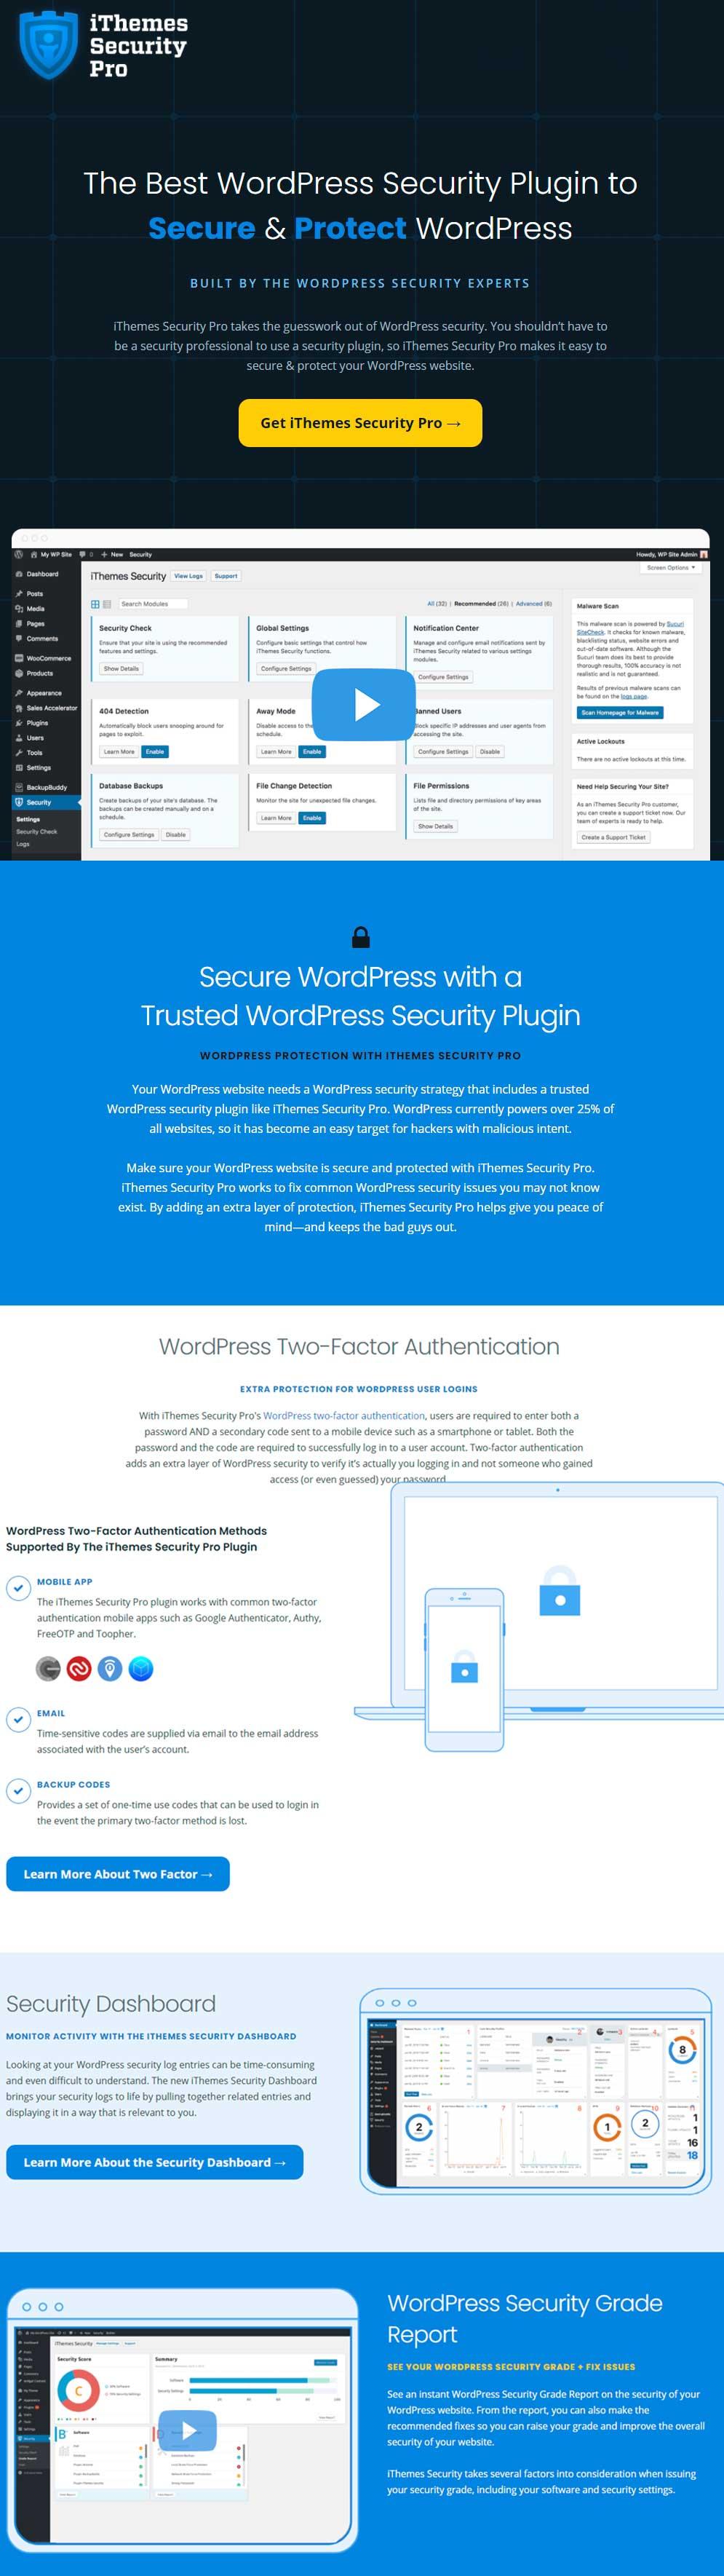 iThemes Security - WordPress Security Firewall Plugin